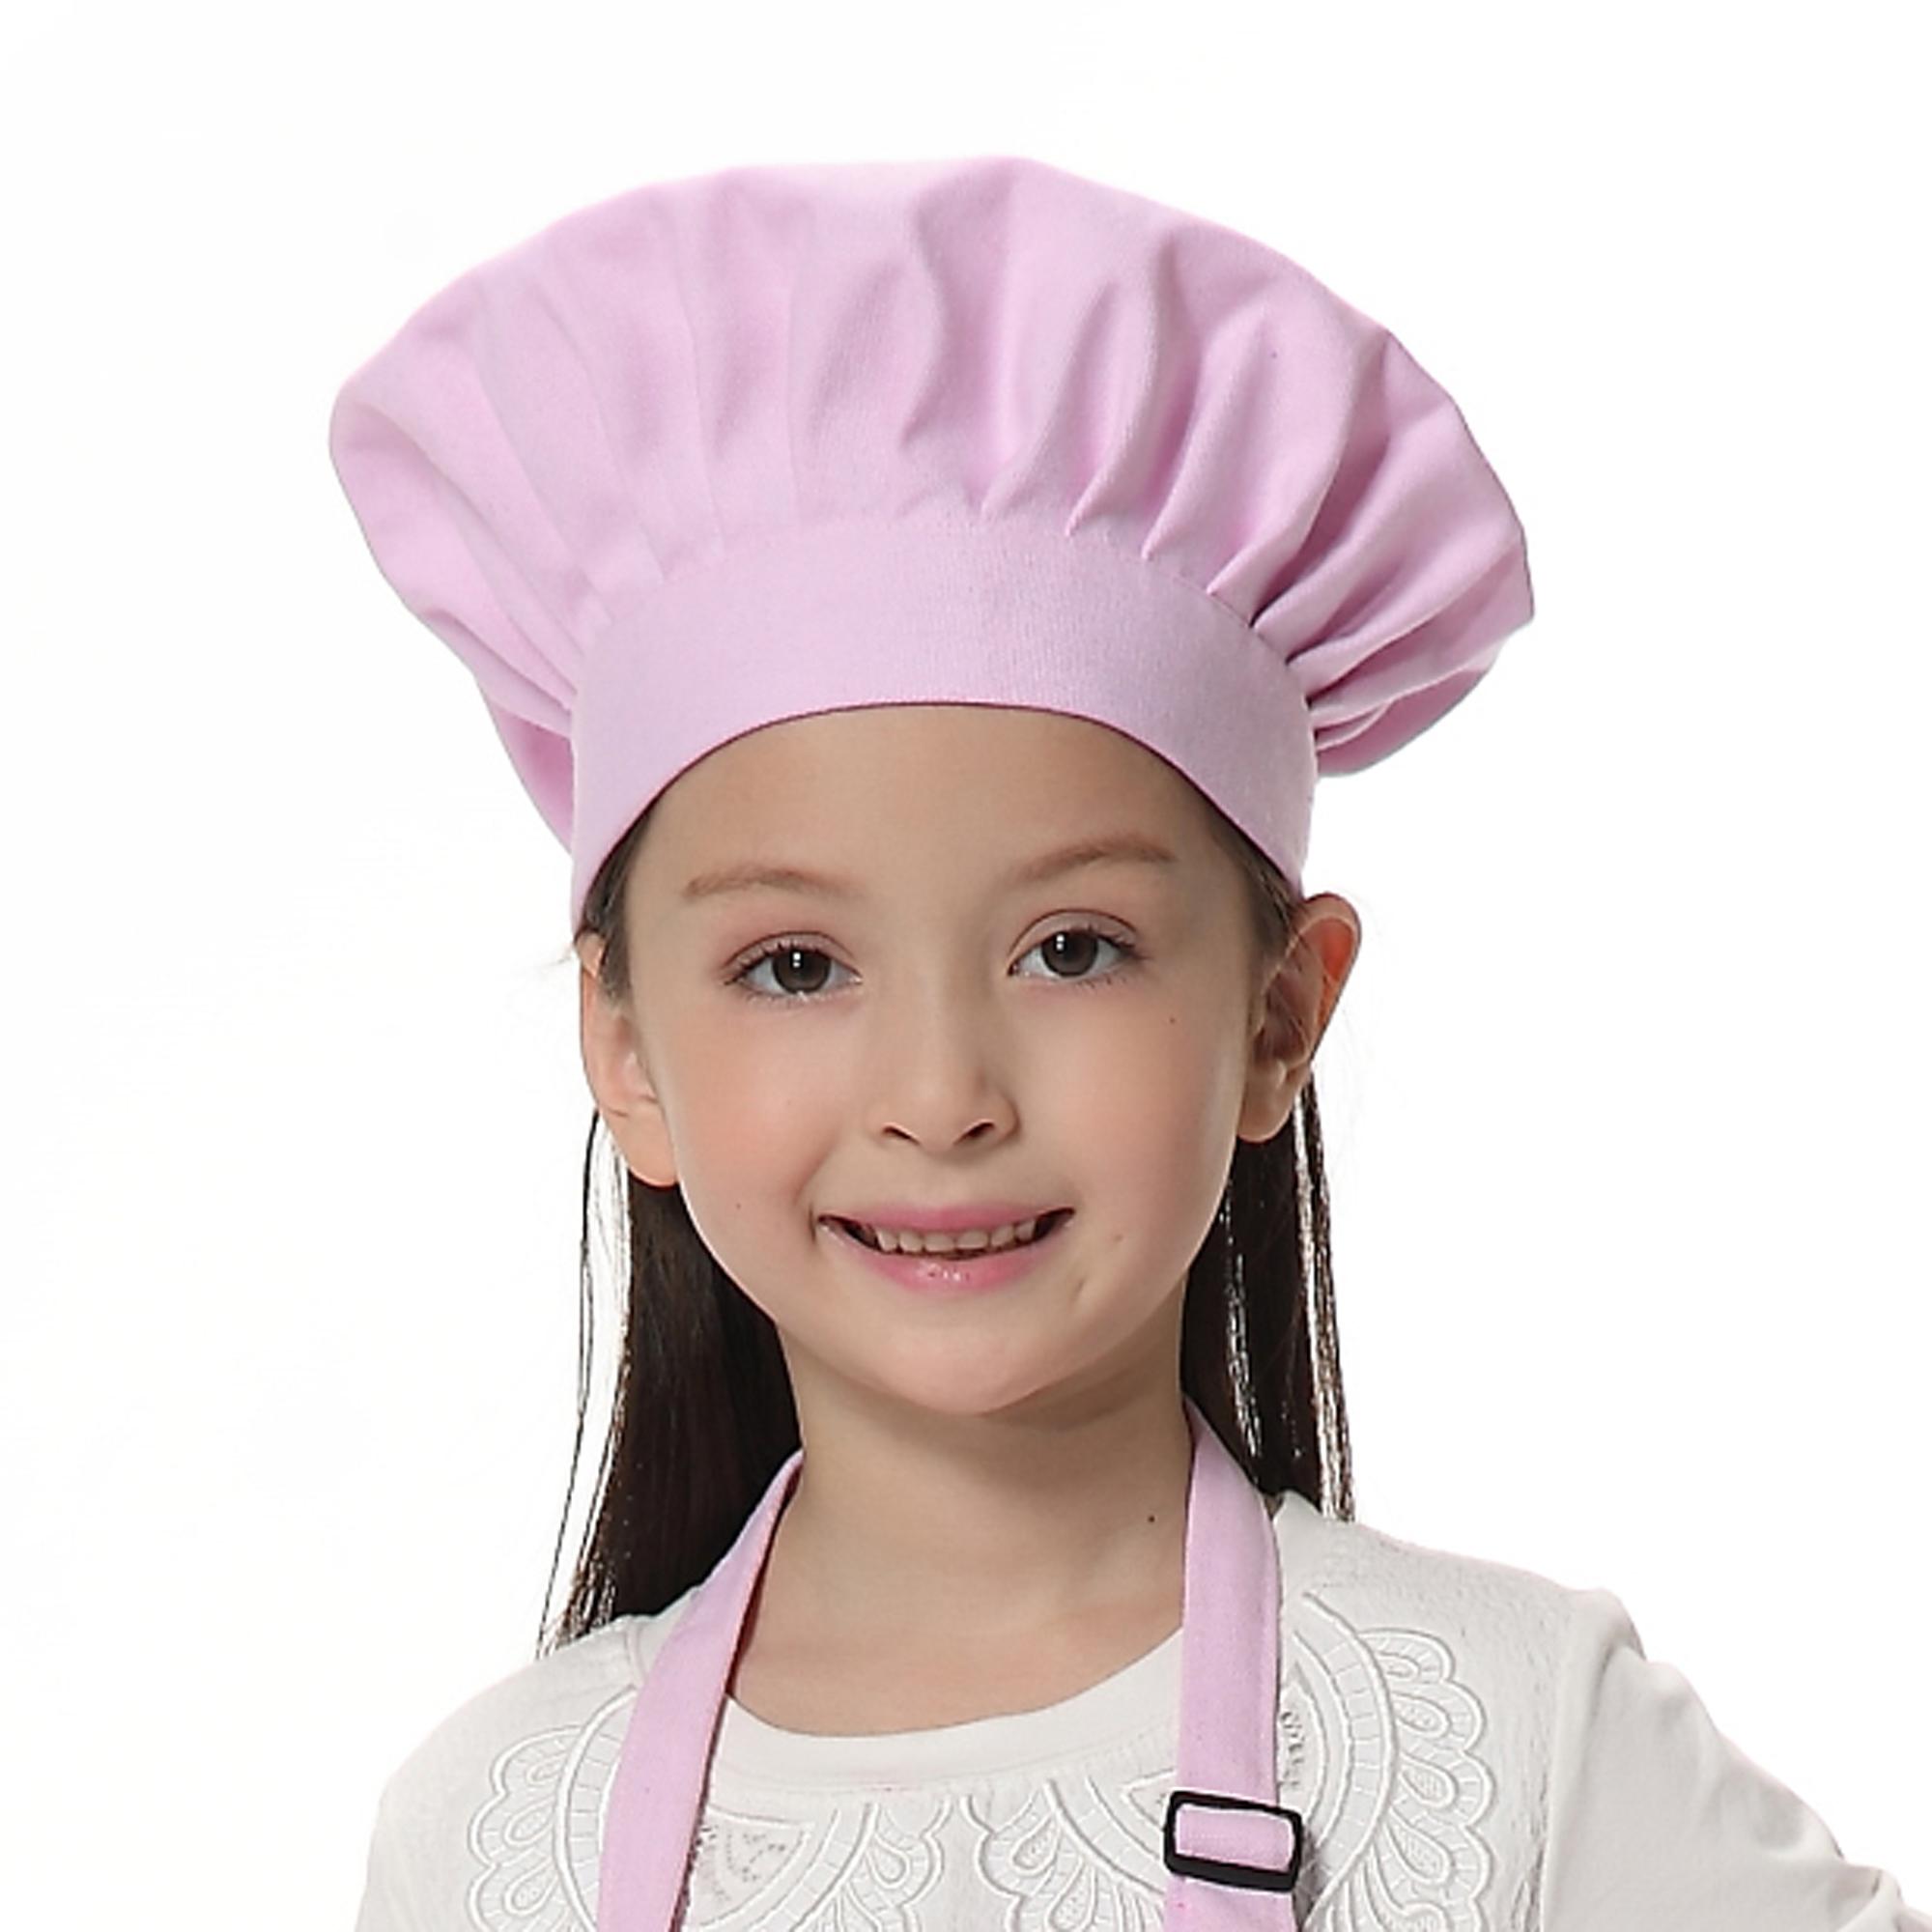 Opromo Child's Chef Hat Kid's Baker Costume Cotton Canvas Mushroom Hat